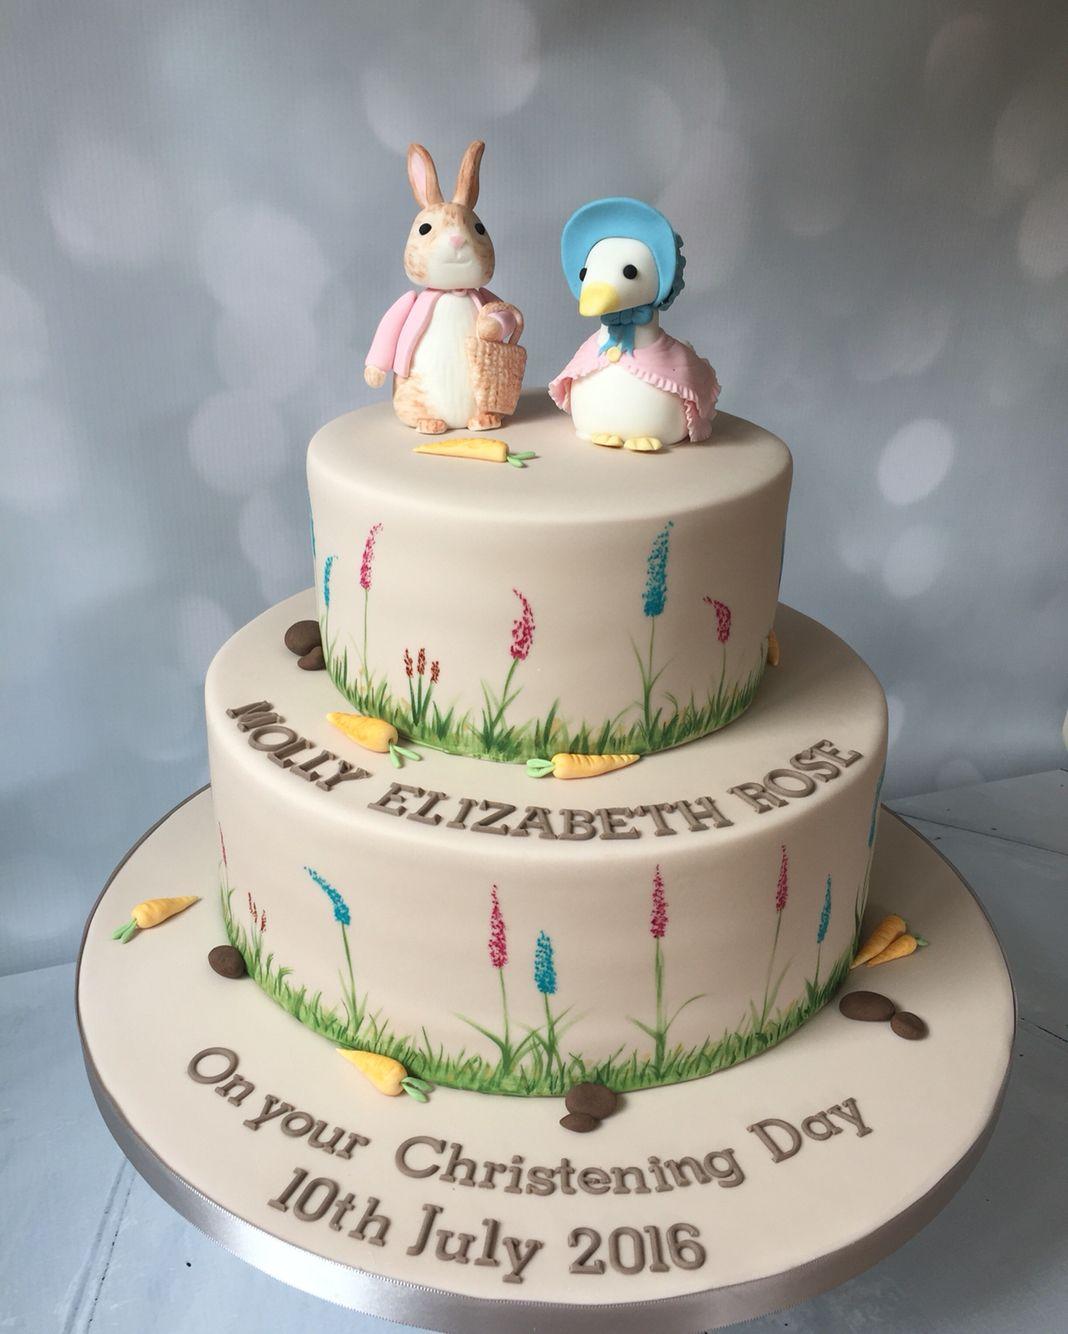 148457c1f109 Beatrix Potter christening cake with Flopsy Bunny and Jemima Puddleduck